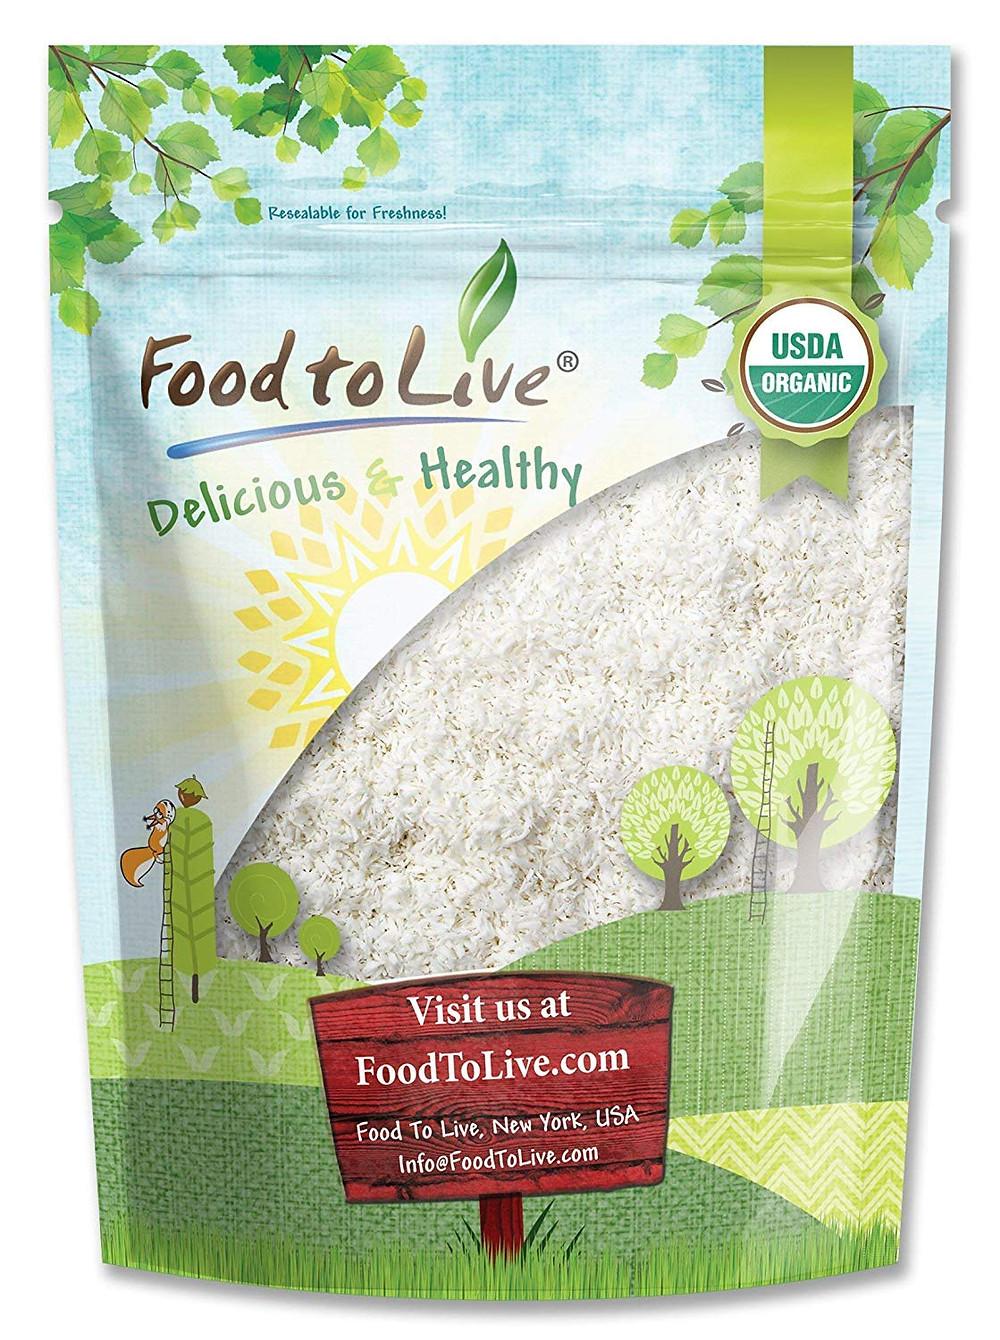 Organic dessicated Coconut keto friendly protein iron fiber & zinc